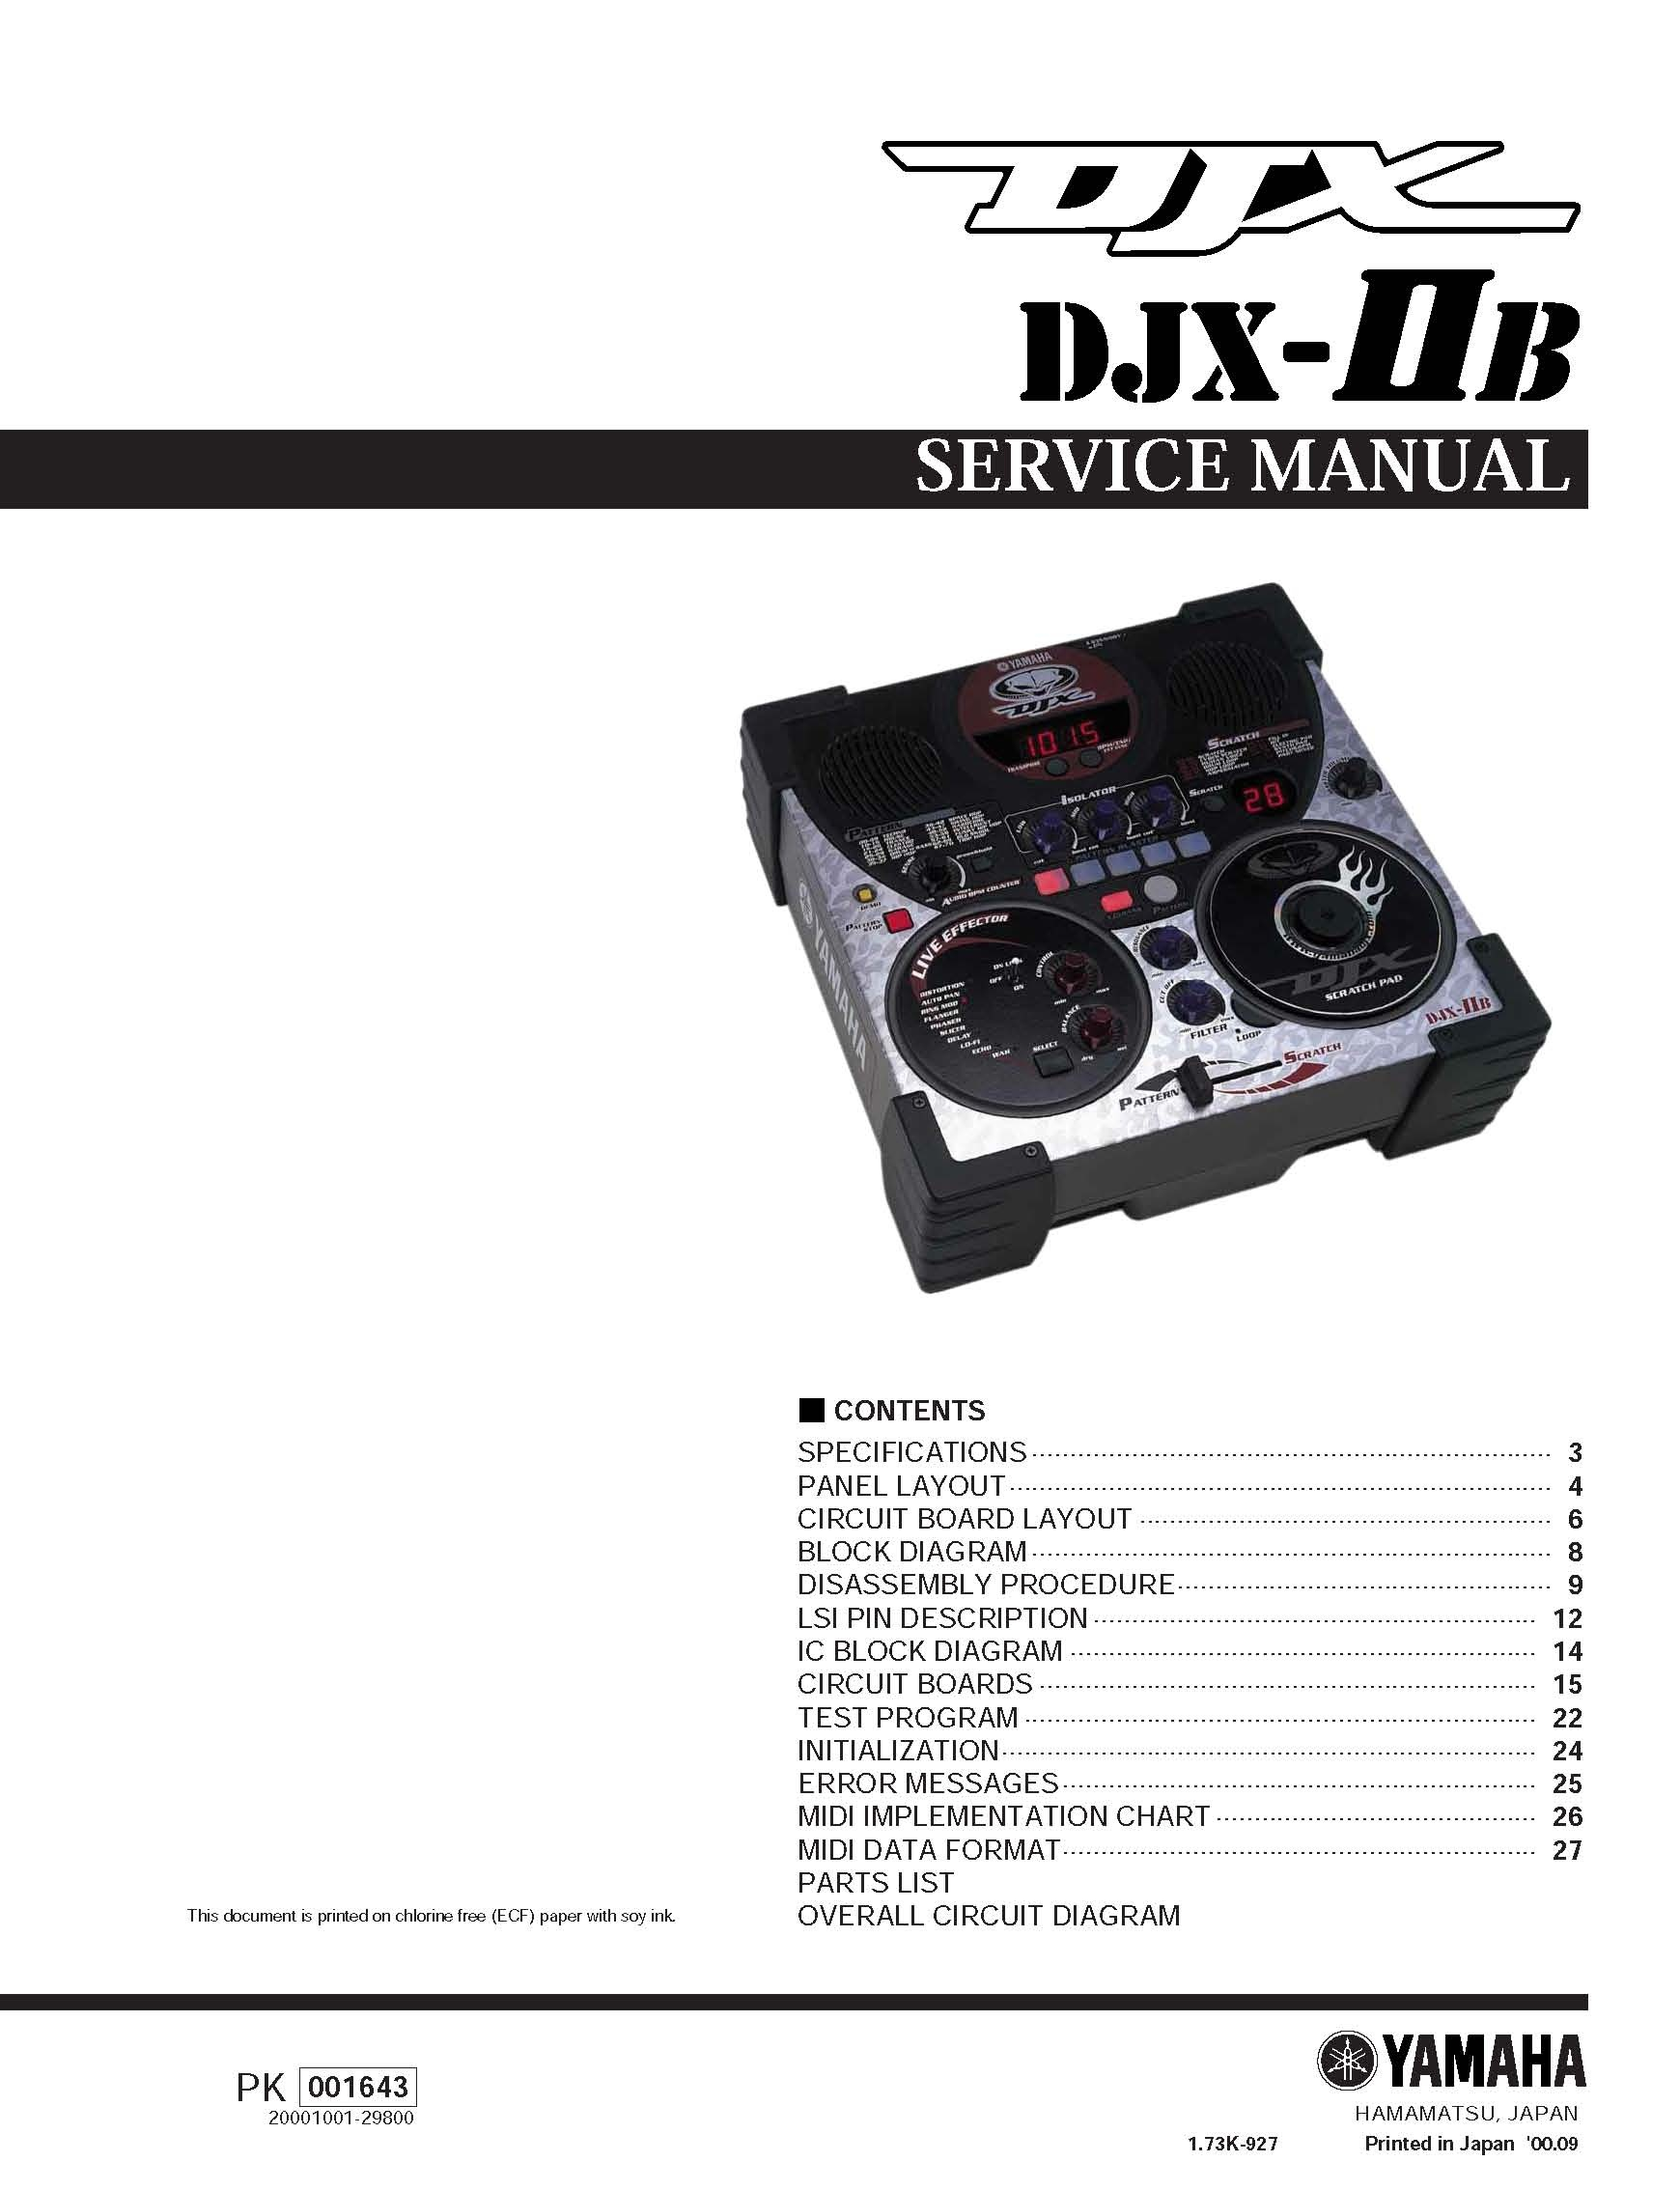 yamaha djx iib service manual music manuals rh sellfy com yamaha djx ii keyboard manual yamaha djx ii manual